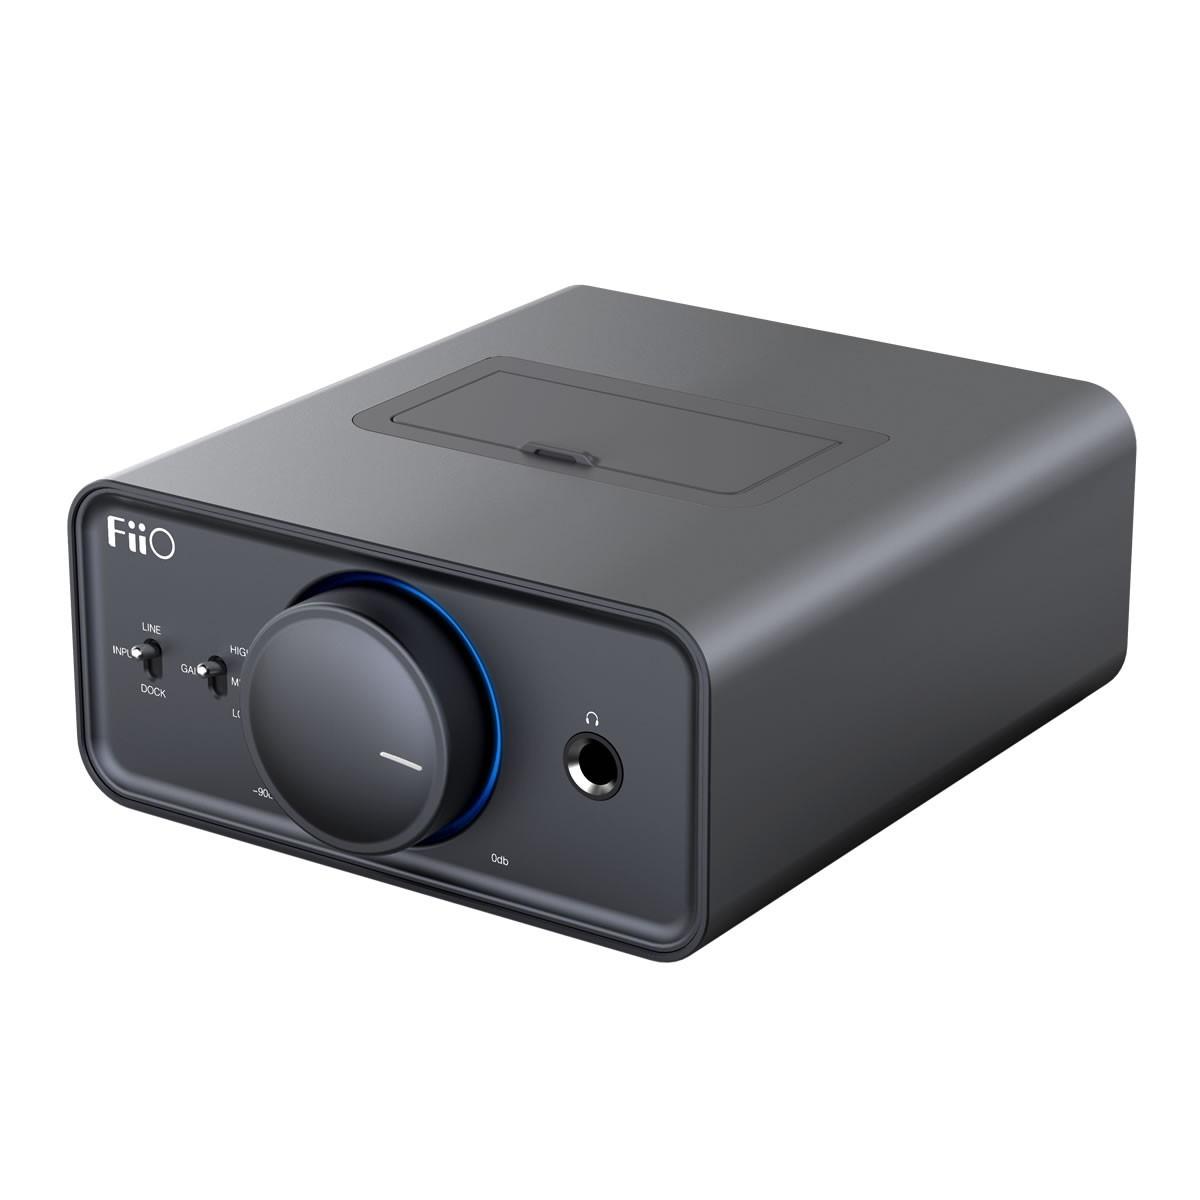 FIIO K5 Amplificateur Casque et Dock pour FIIO X1 / X3II / X5II / X7